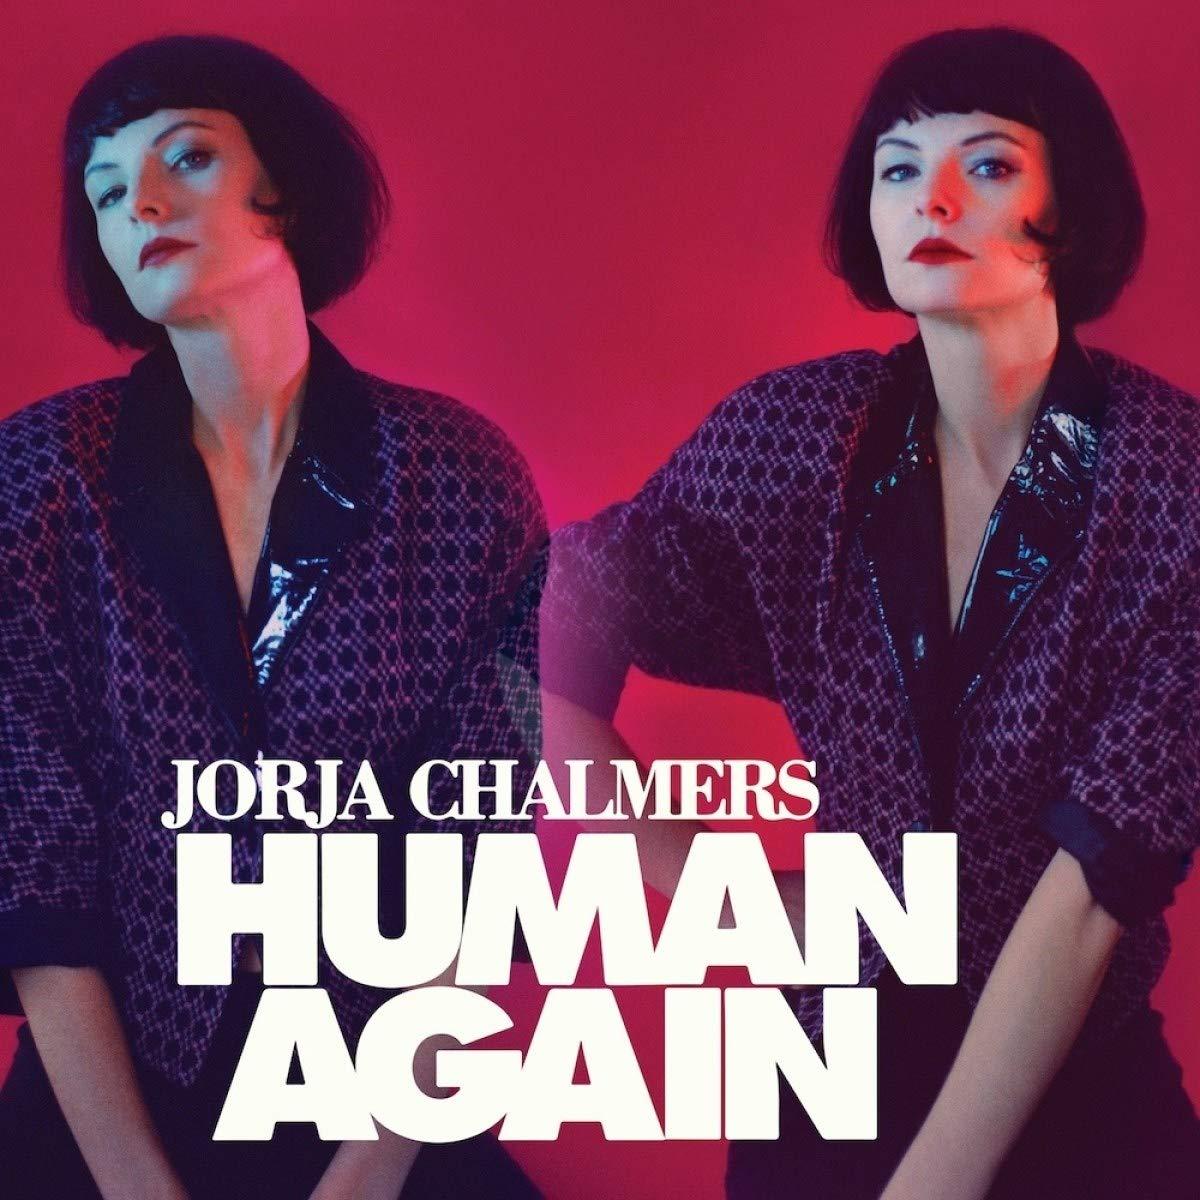 JORJA CHALMERS - HUMAN AGAIN (CD)